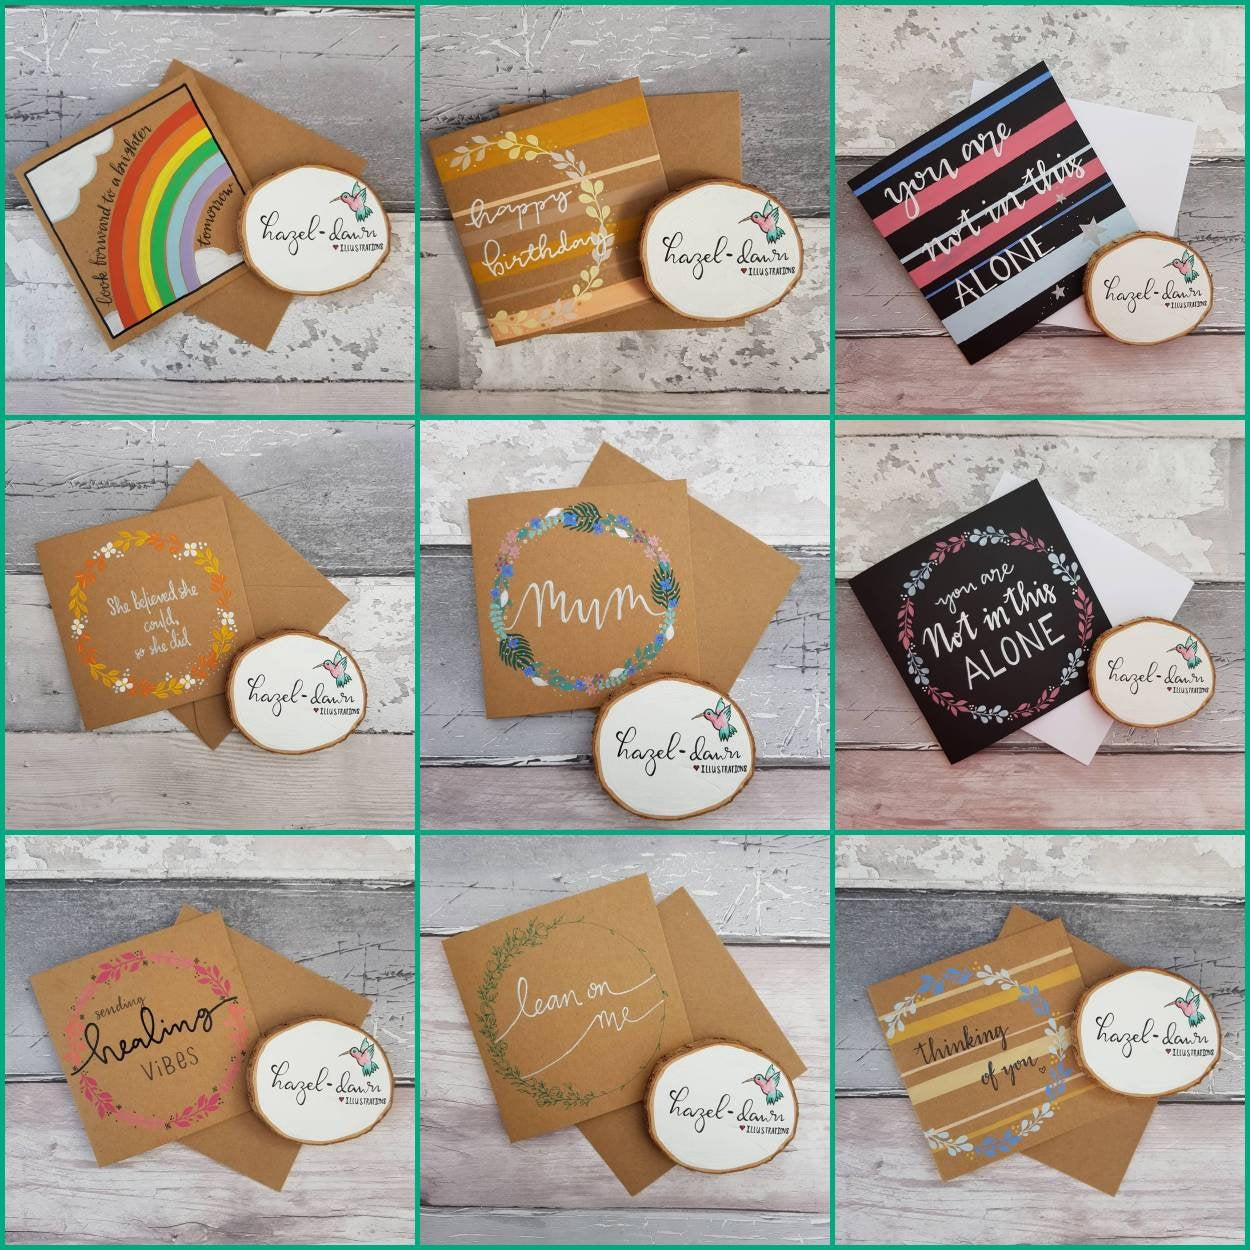 Sending Healing Vibes Card, Blank Card, Friendship, Motivation, Support – Handmade Kind Shop 4